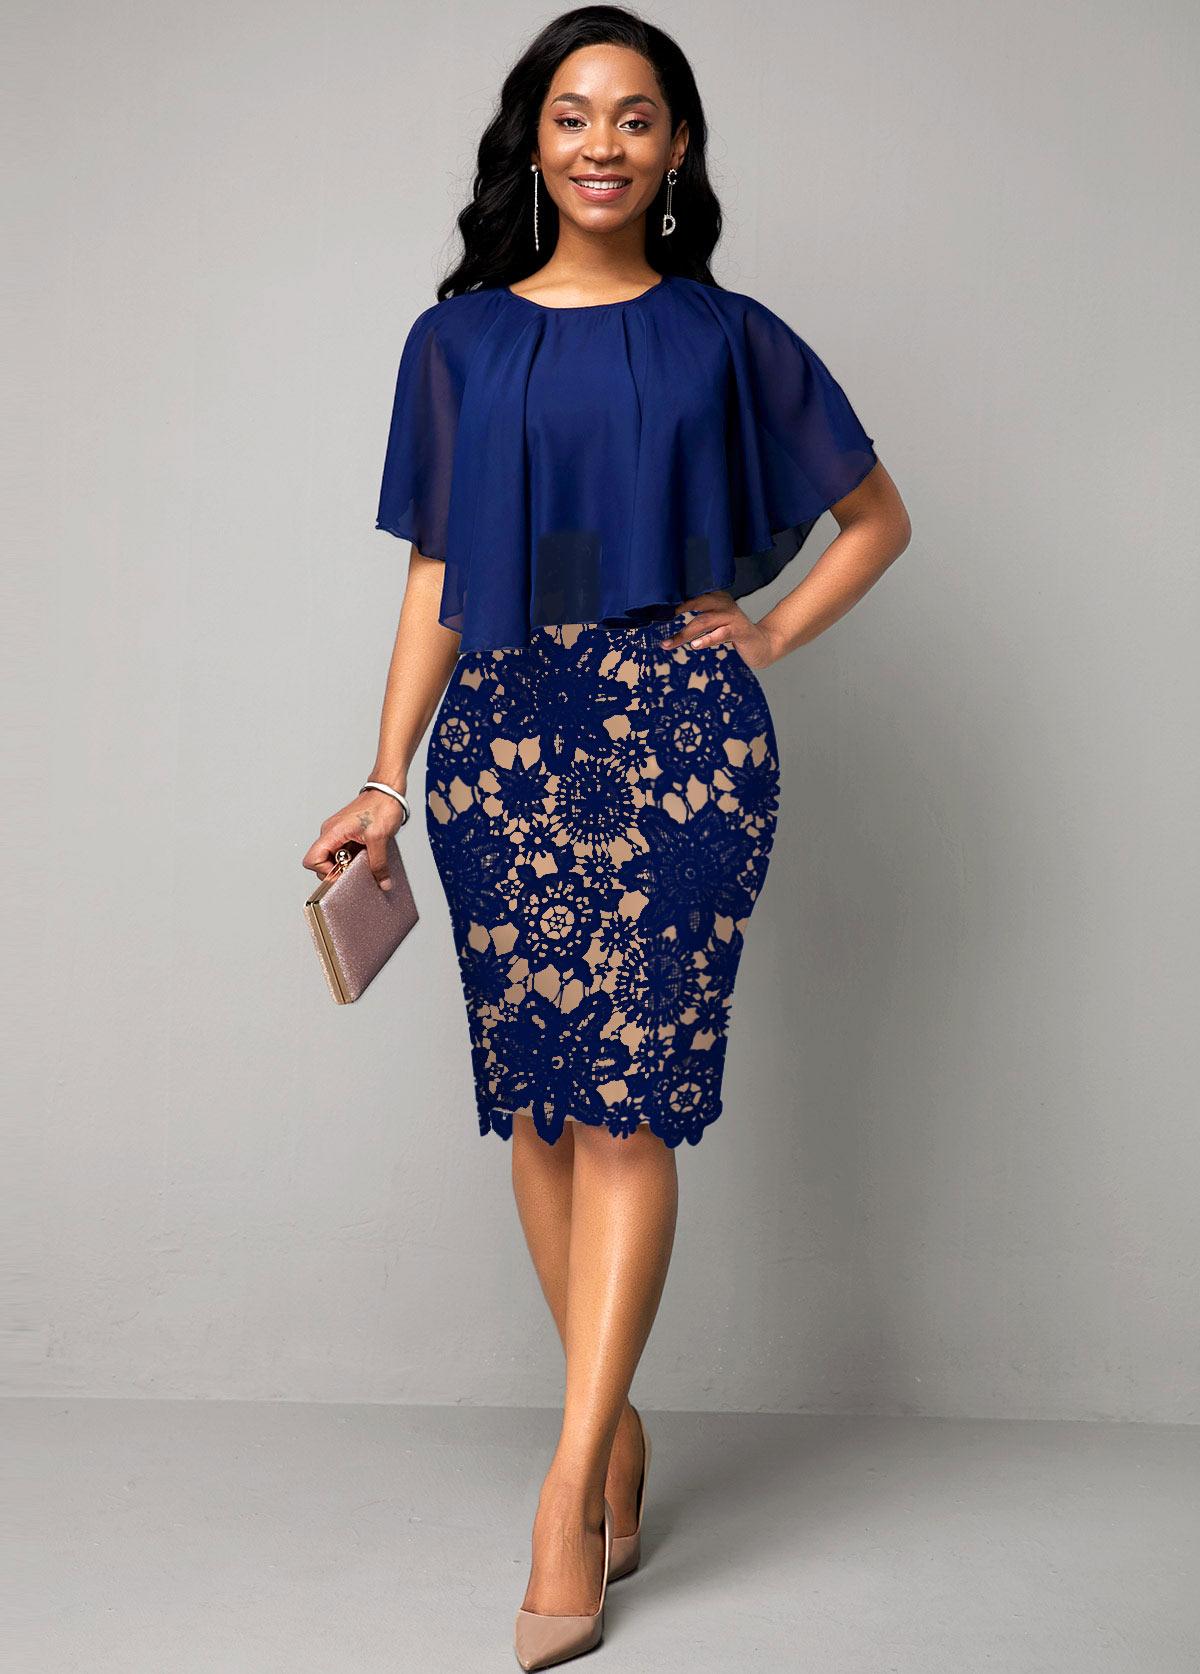 ROTITA Cape Sleeve Lace Panel Navy Blue Dress